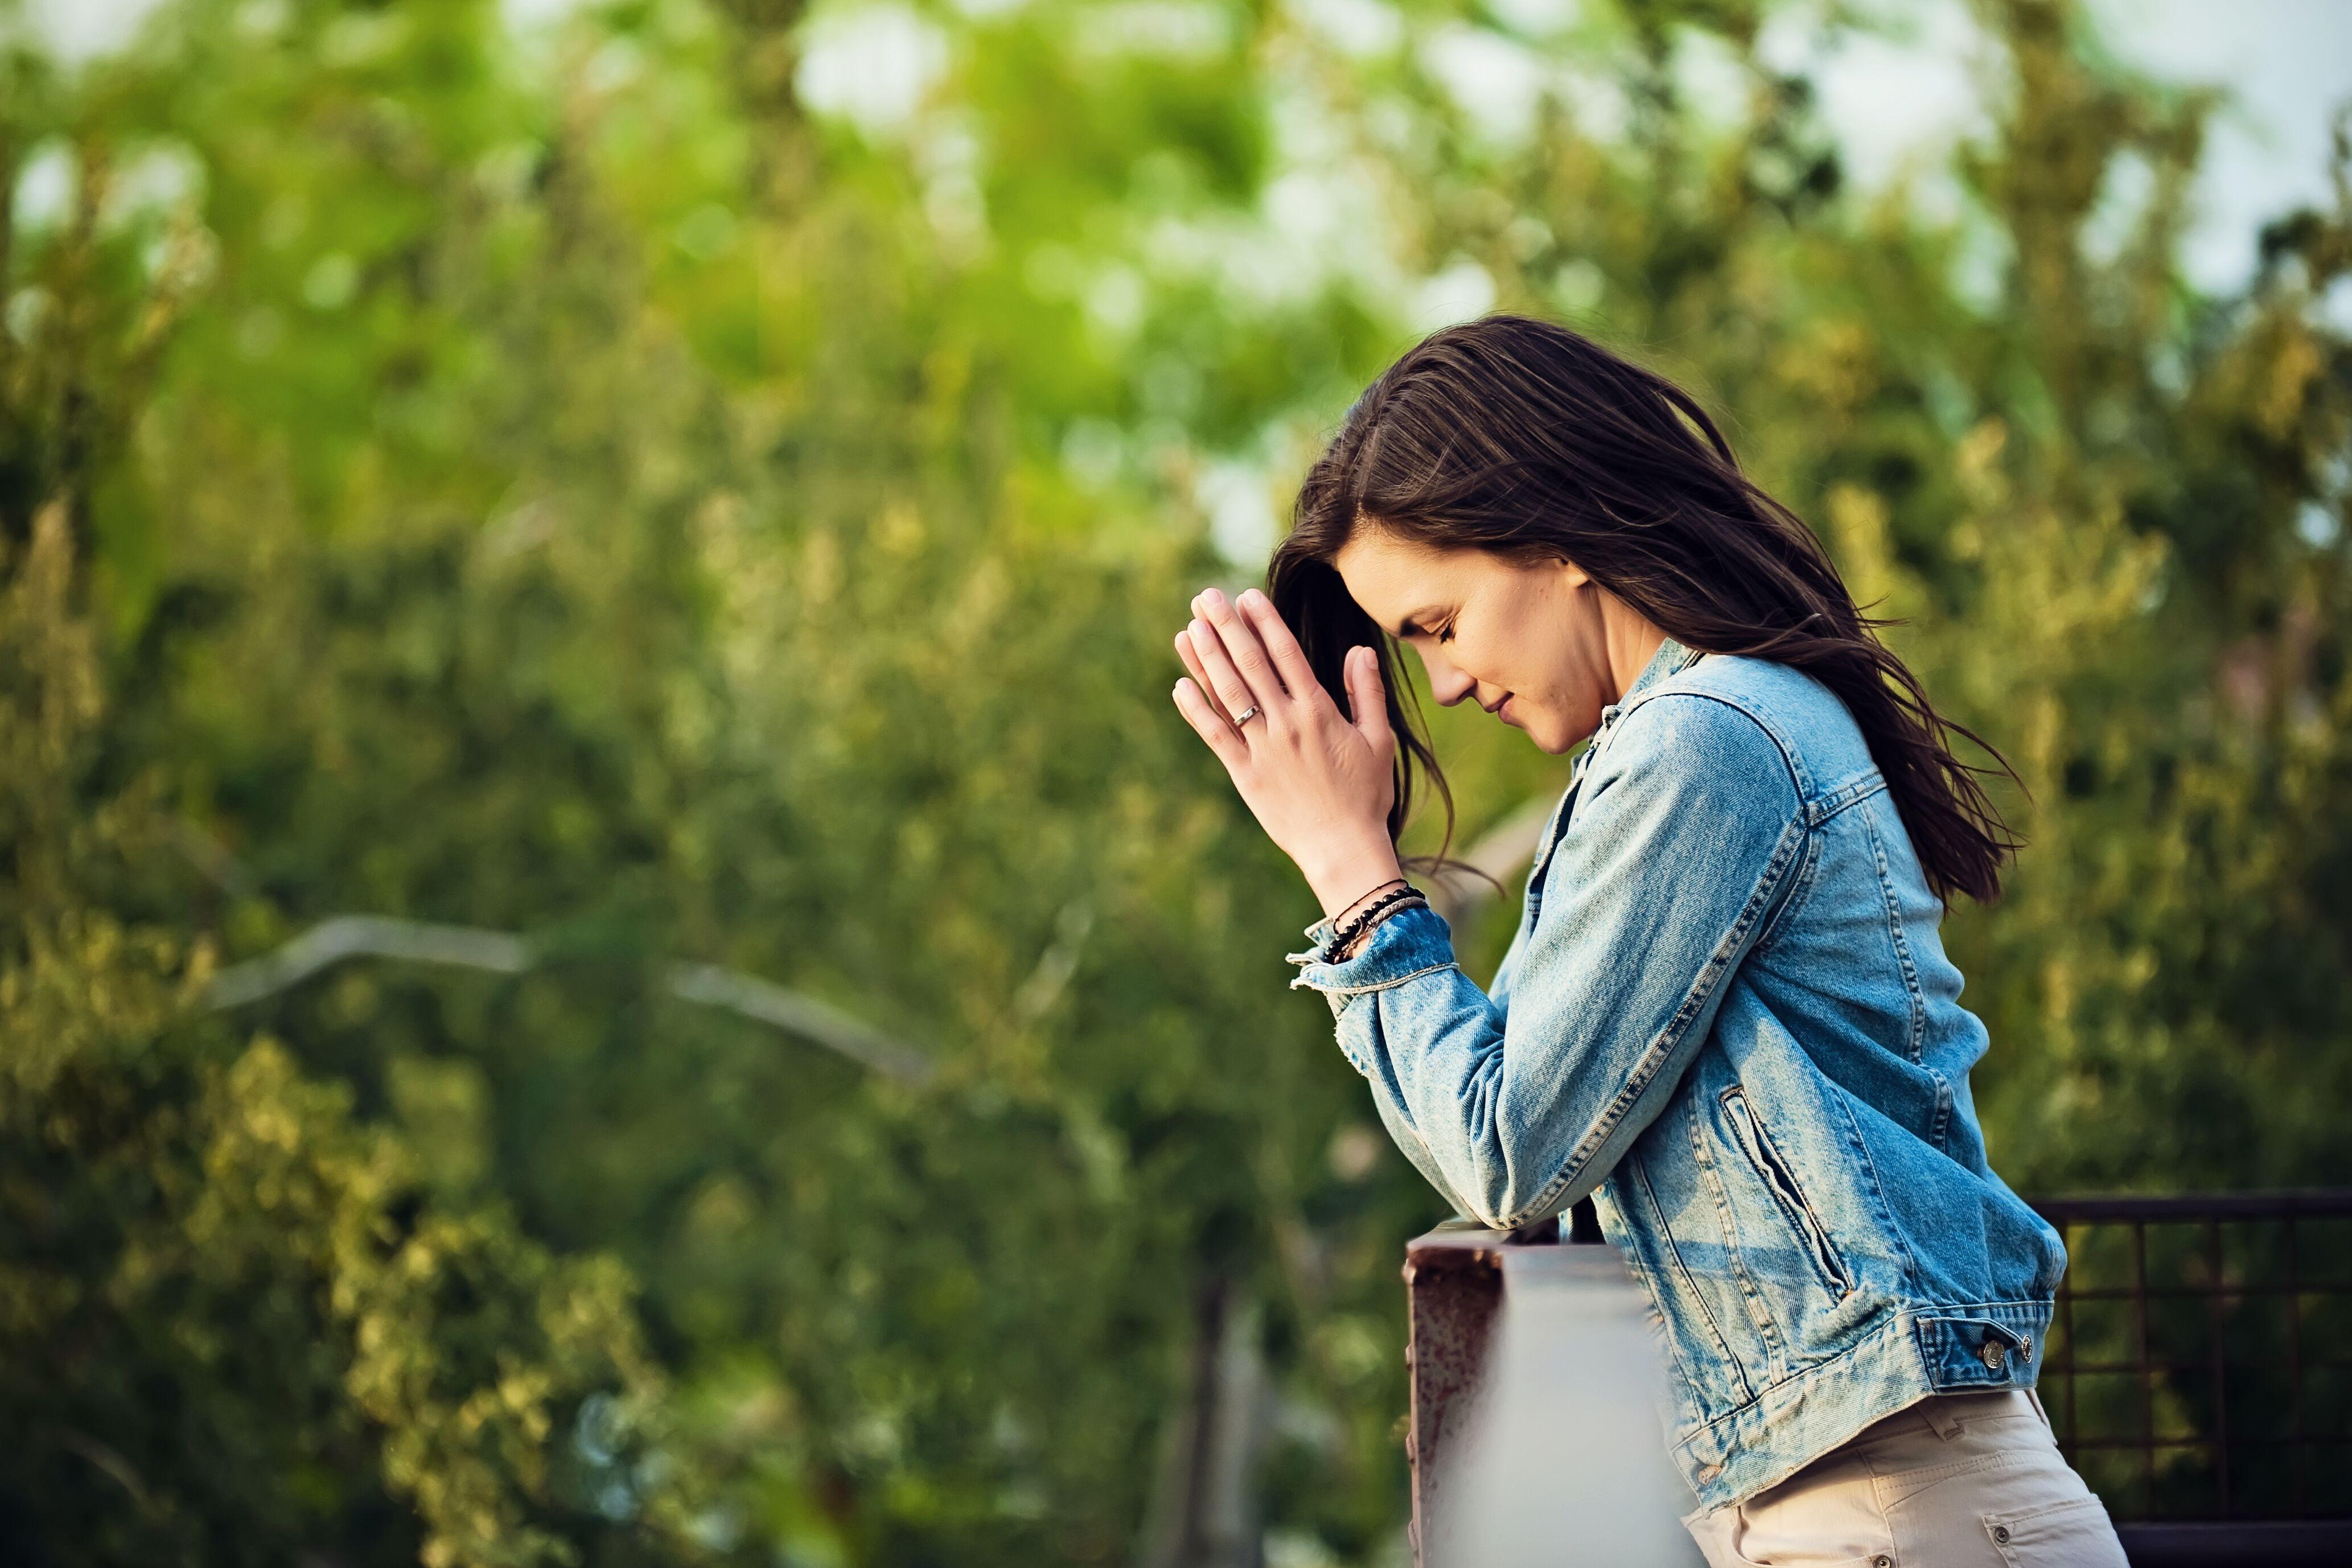 Andy Art of Prayer and Meditation